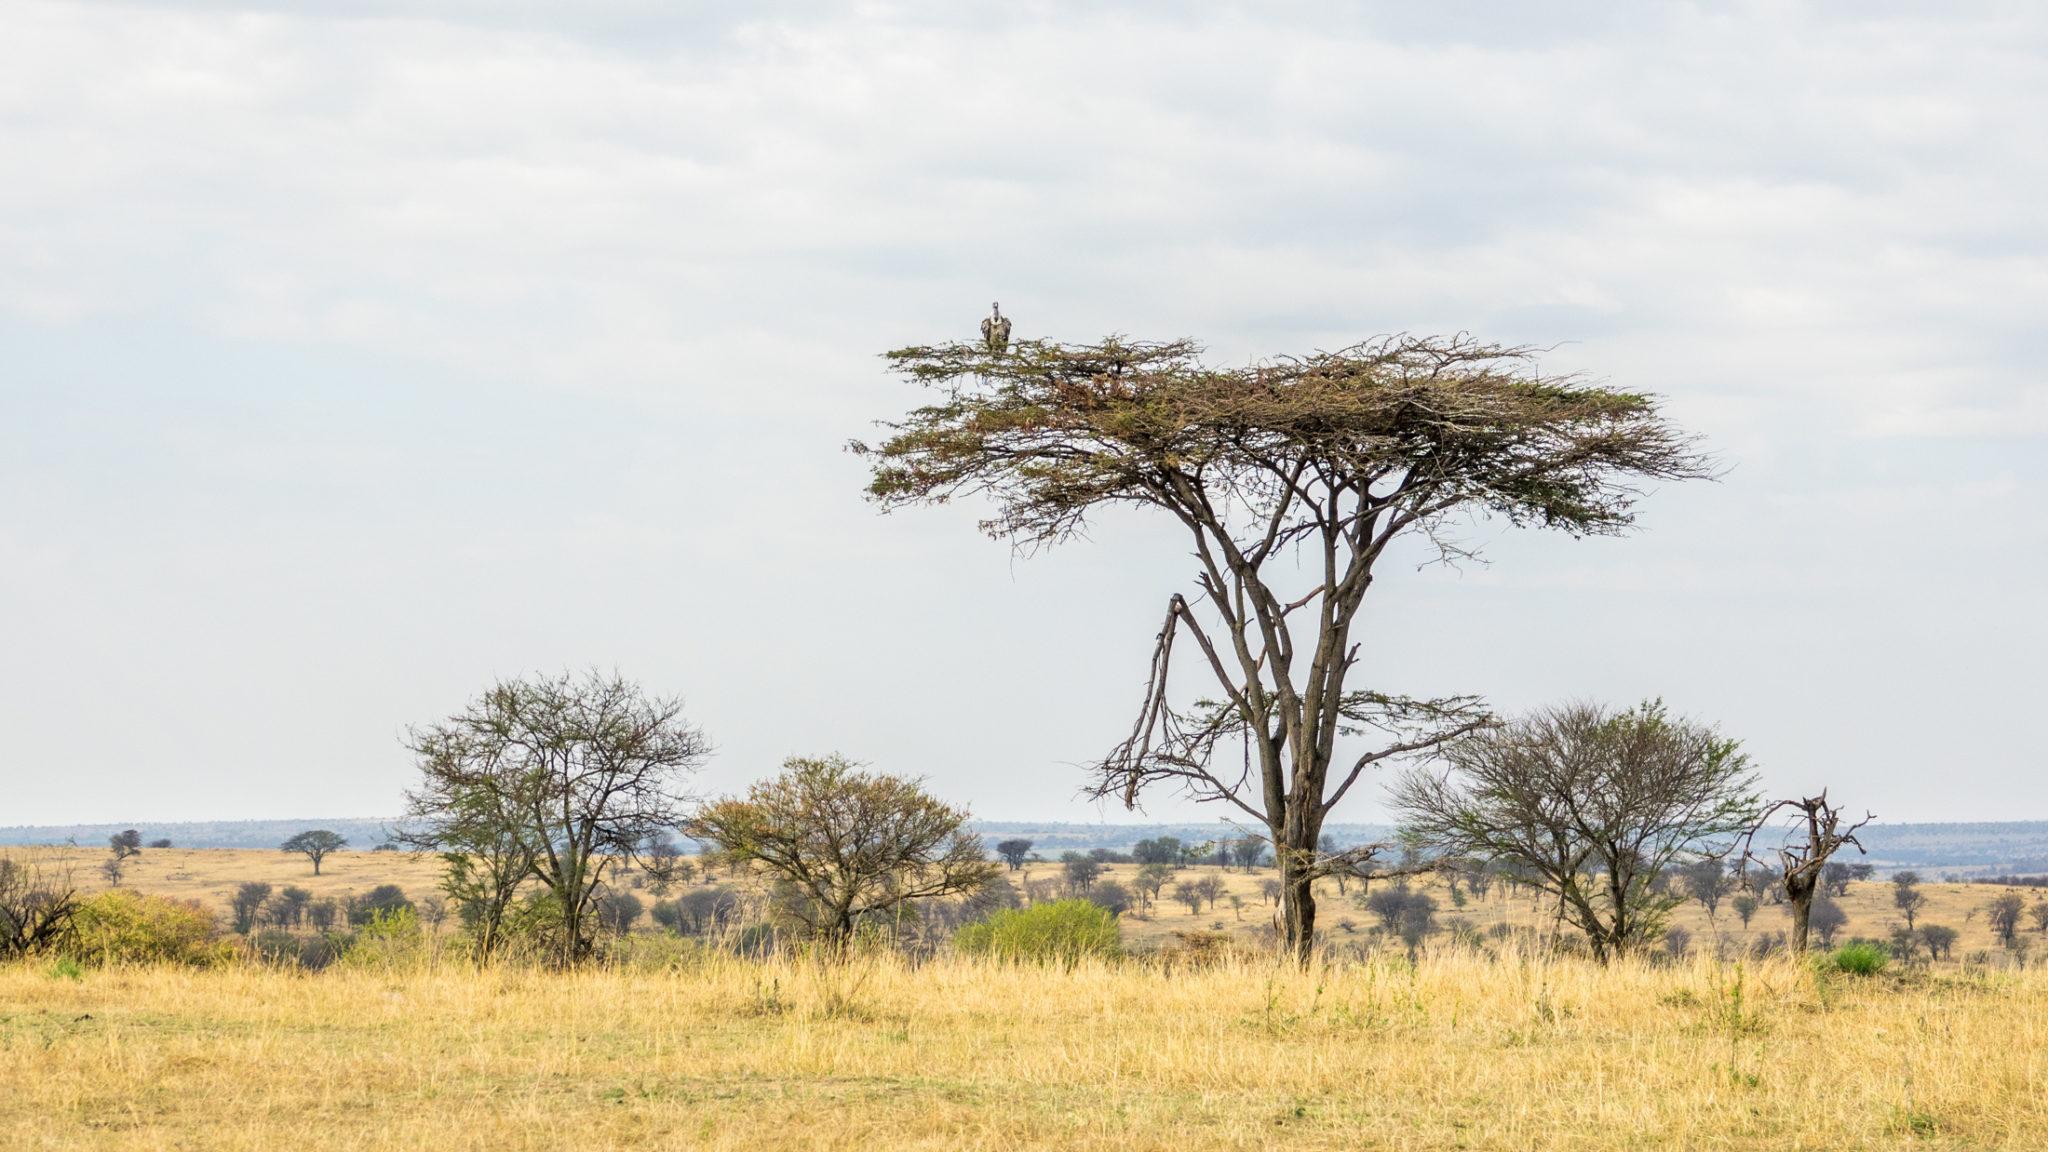 Geier sitzt auf Akazienbaum in Serengeti, Tansania